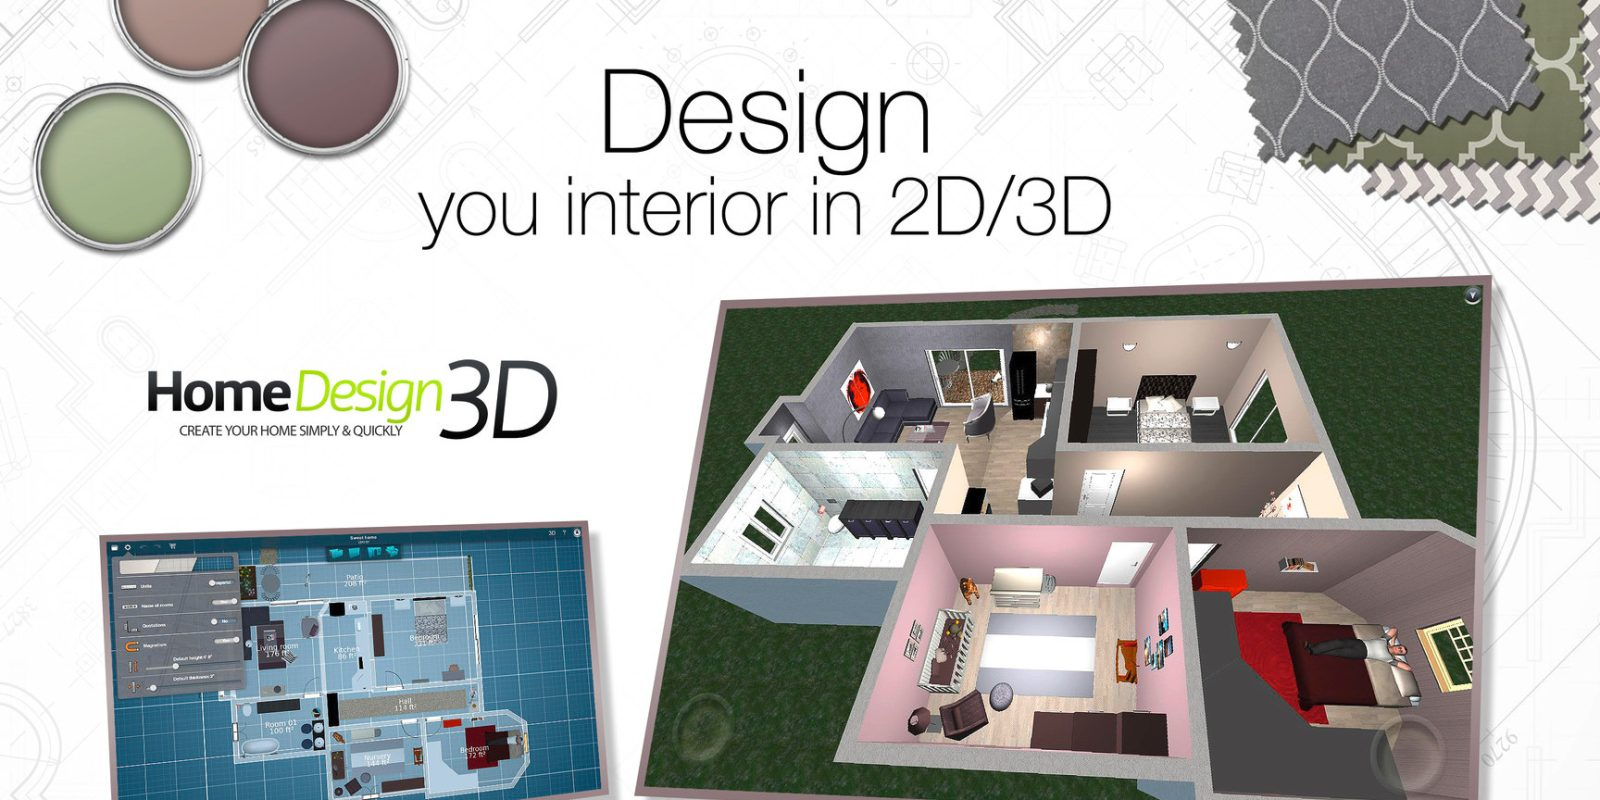 Home Design 3D Gold Free